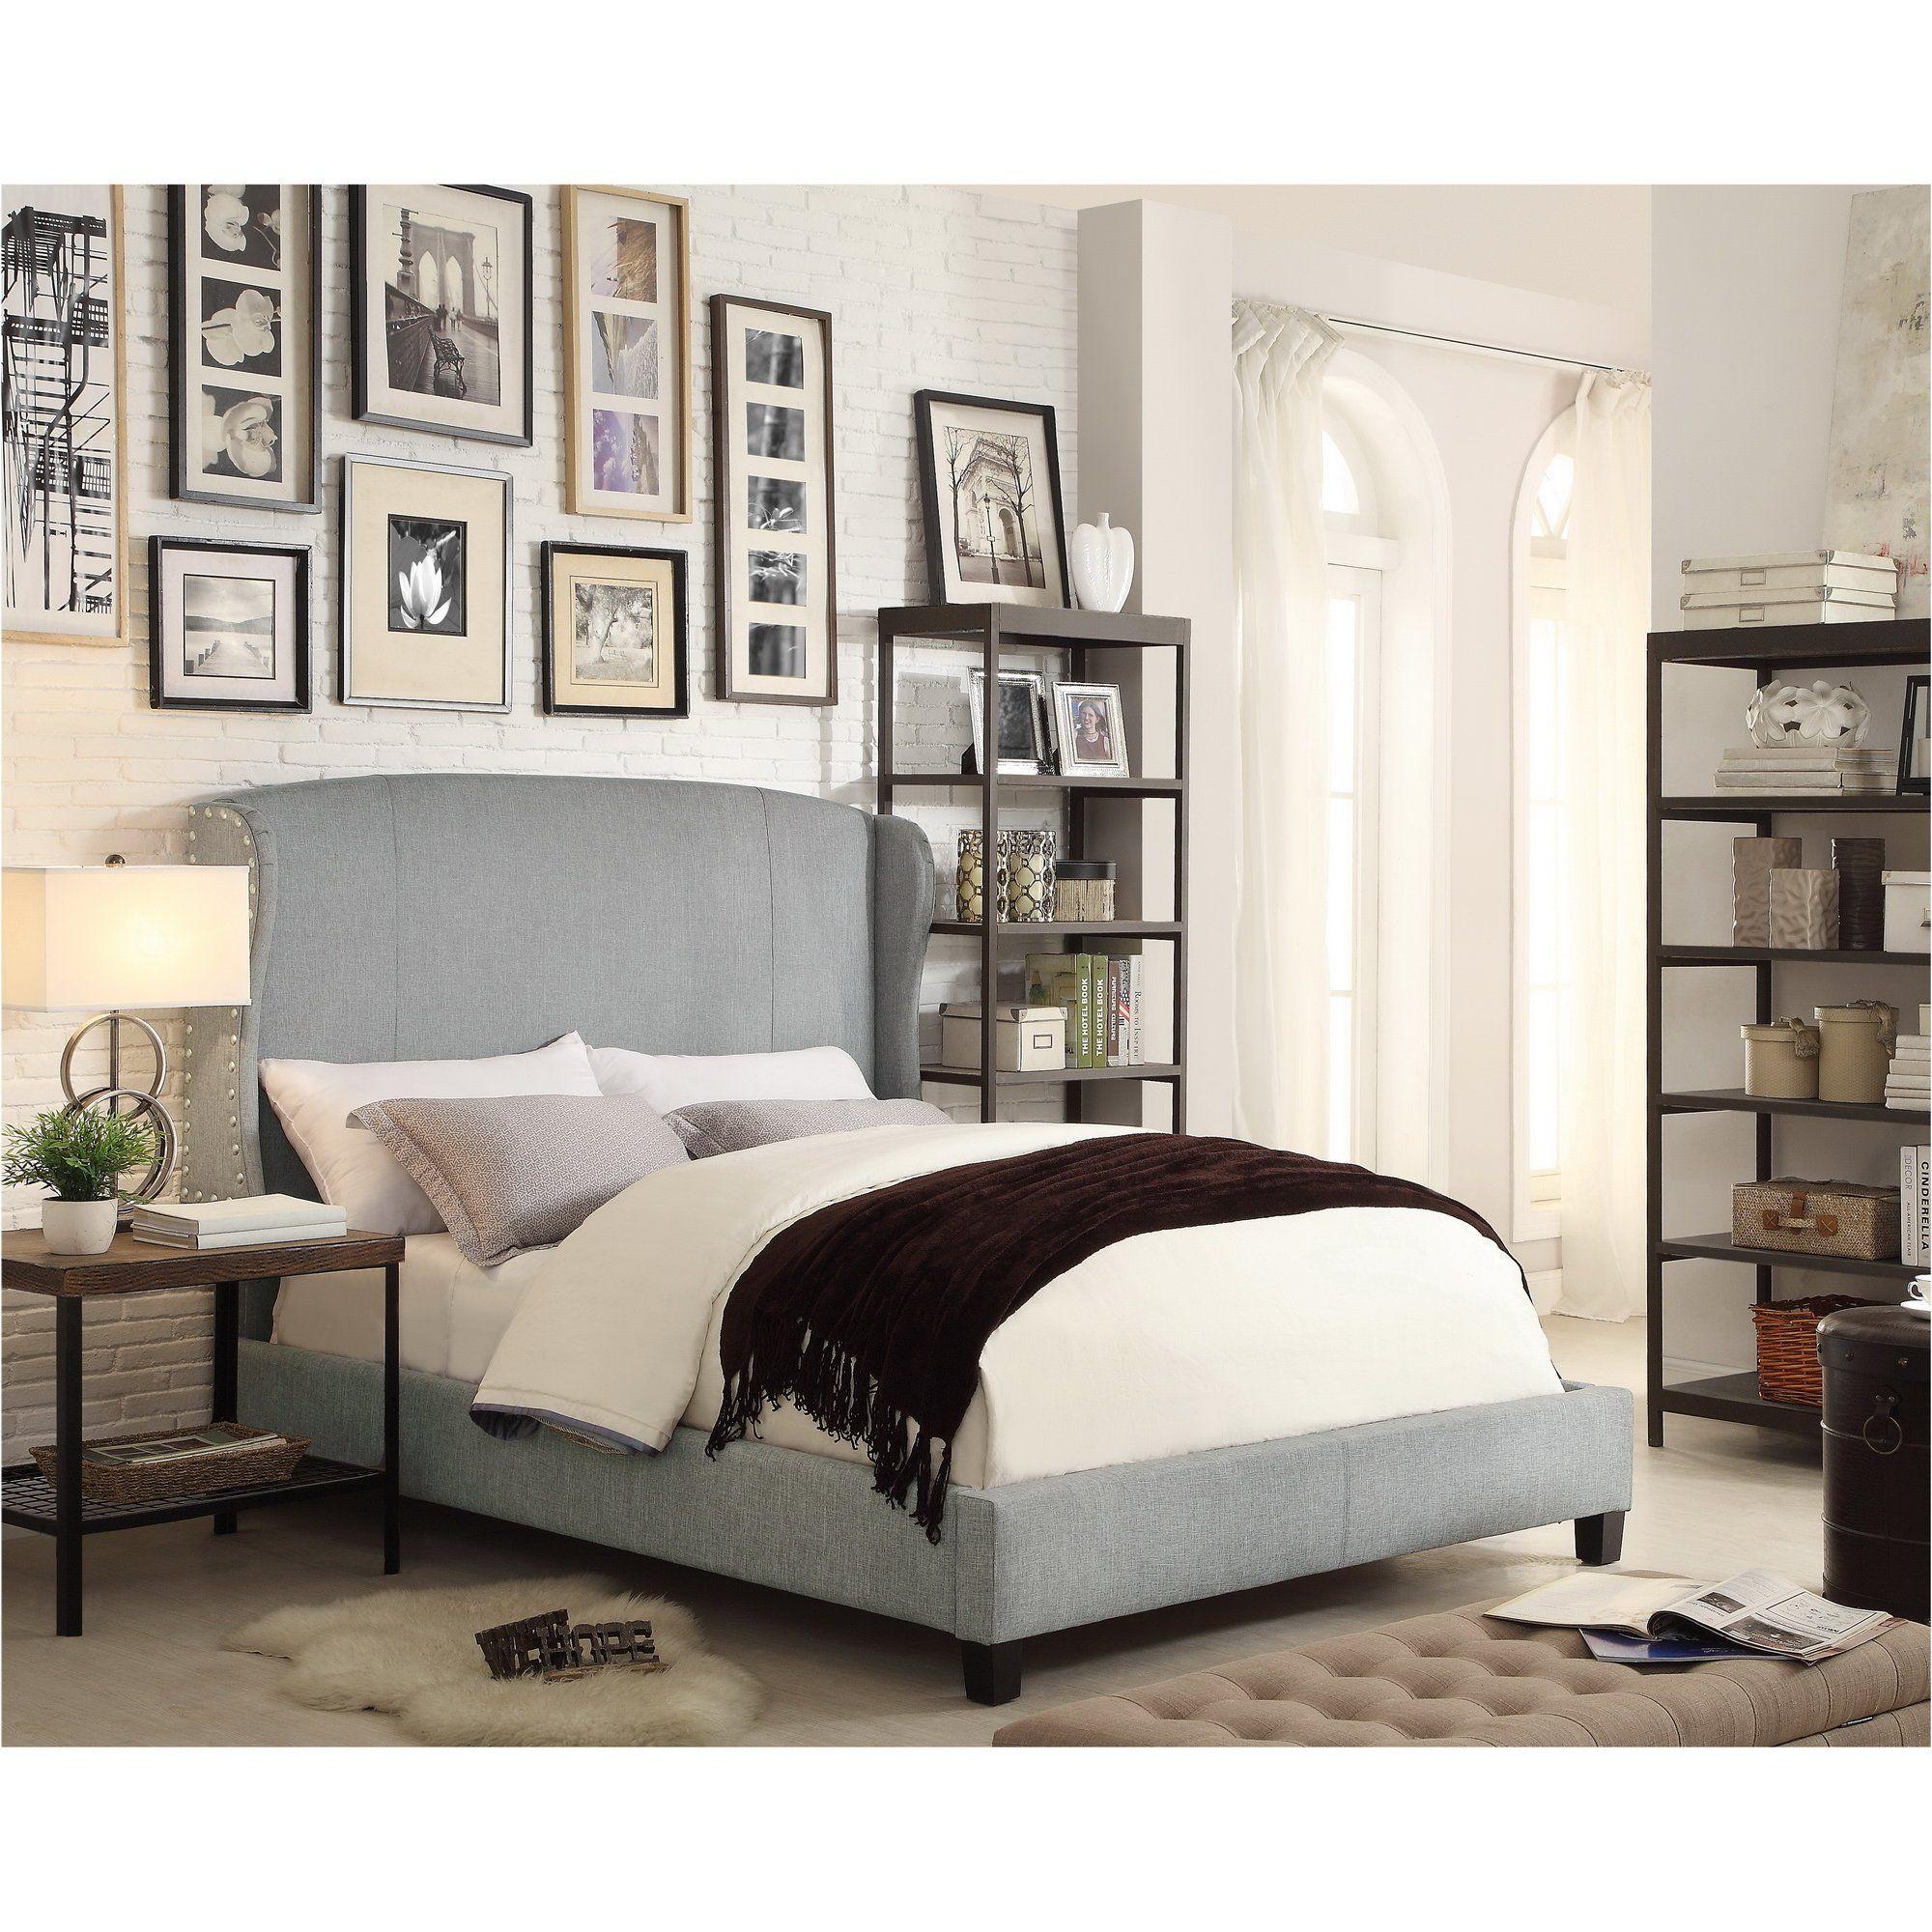 Customer Image Zoomed Upholstered panel bed, Upholstered